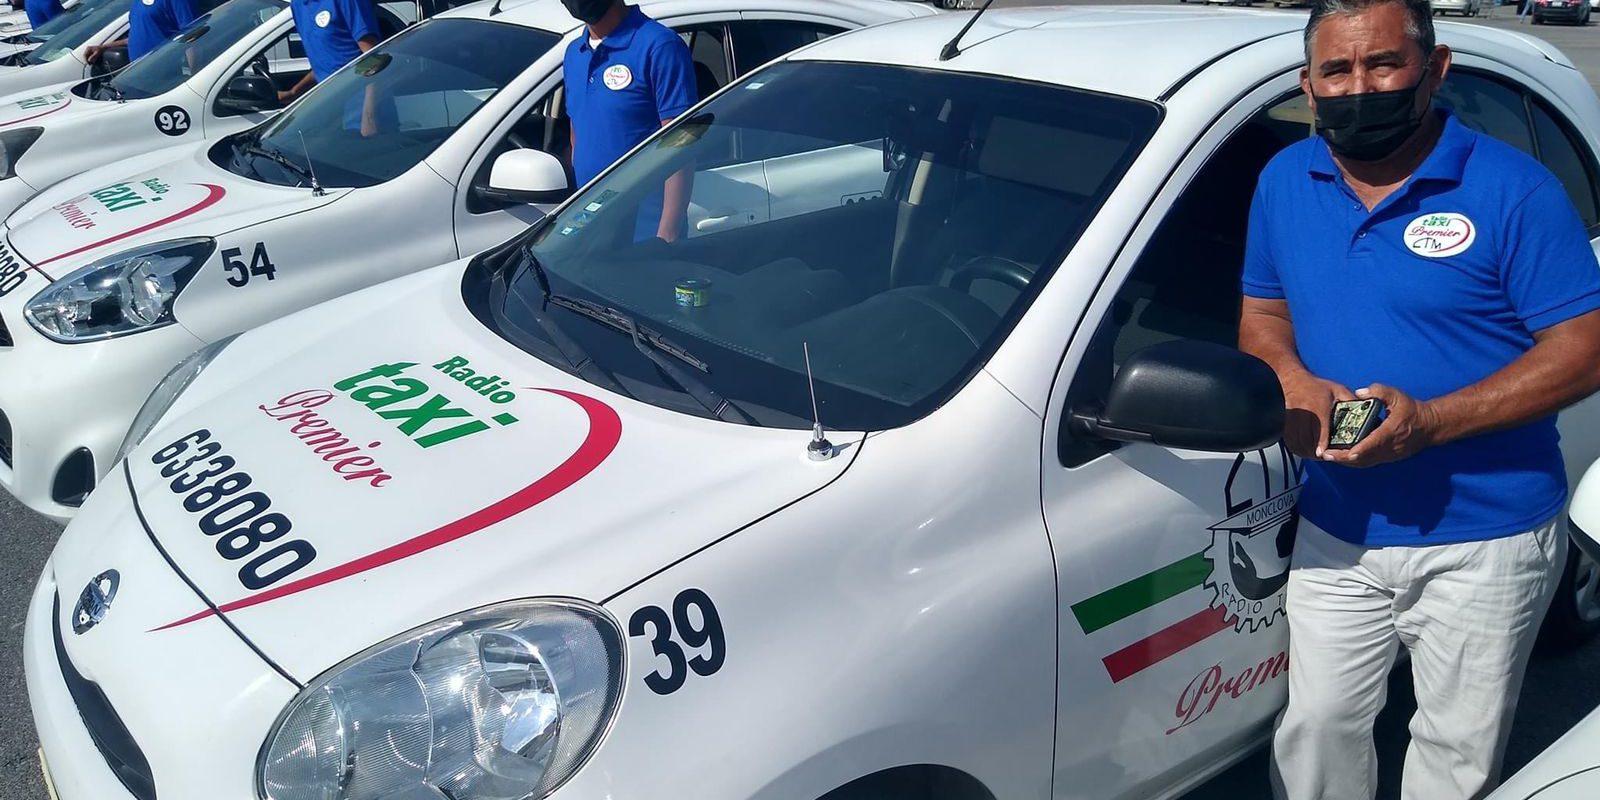 Uniforman a los choferes de la linea de taxis premier en Monclova